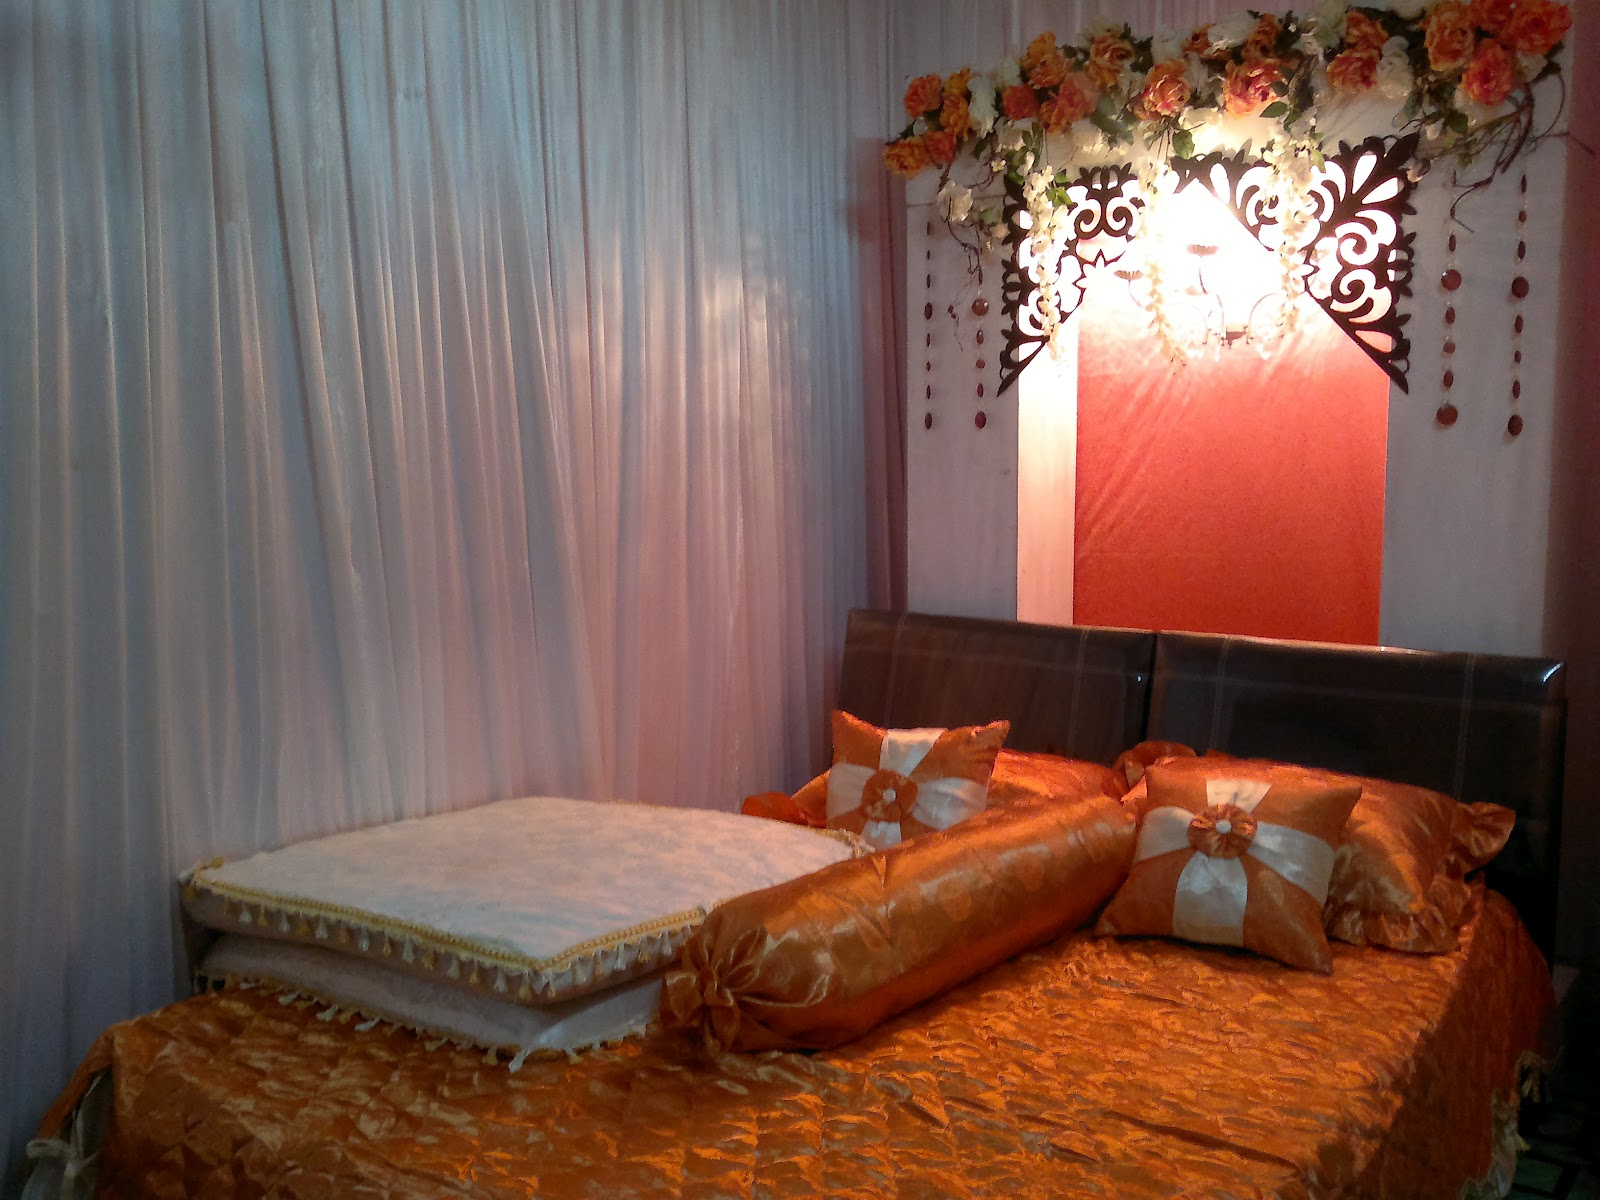 Hiasan Bilik Pengantin Rumah Kampung Desainrumahid My Life S Story Blog Wedding Review Pelamin